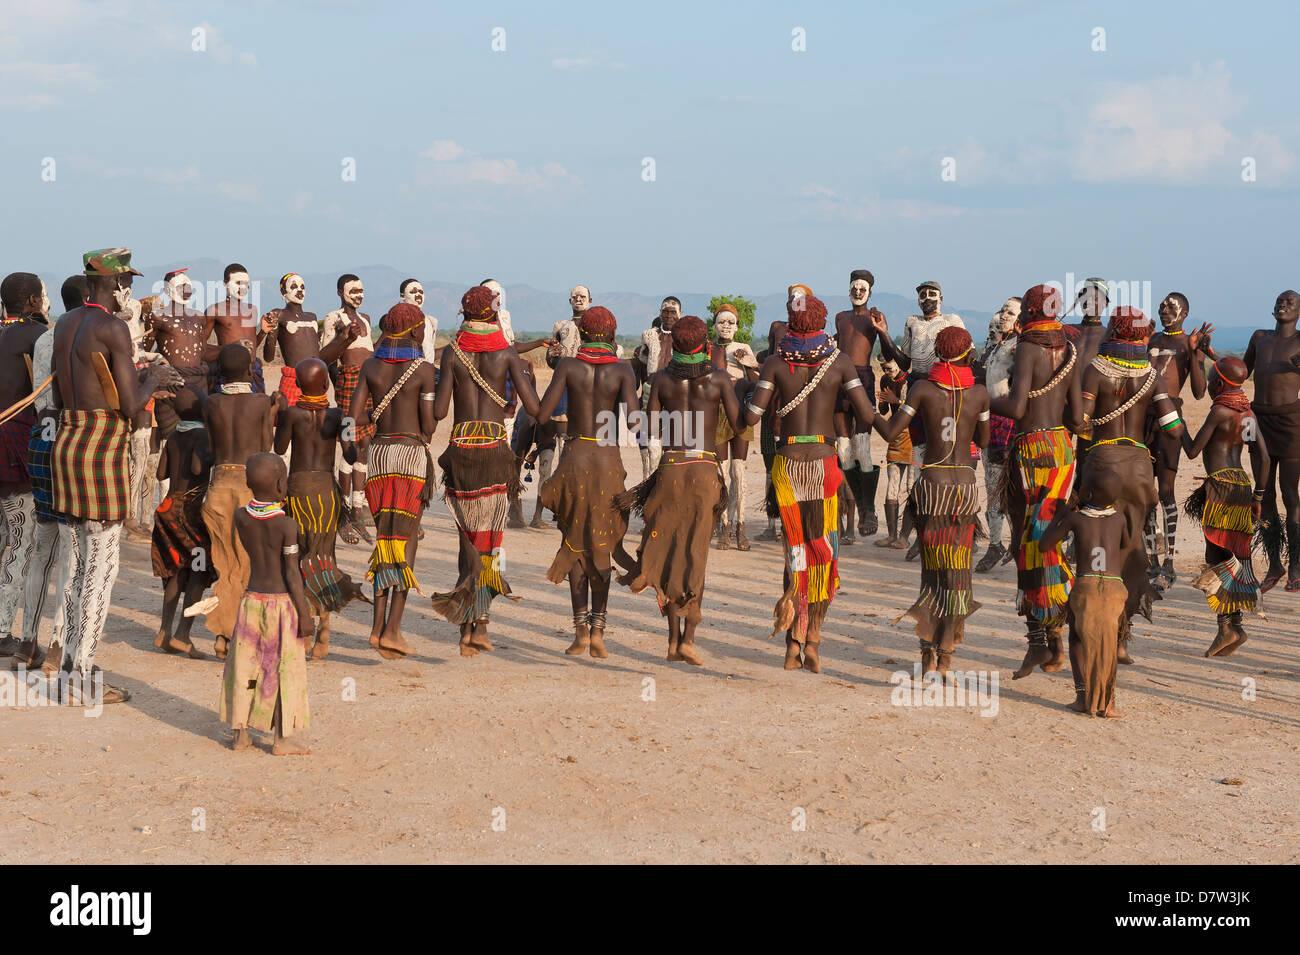 Nyangatom (Bumi) danze tribali cerimonia, Omo River Valley, Etiopia Immagini Stock